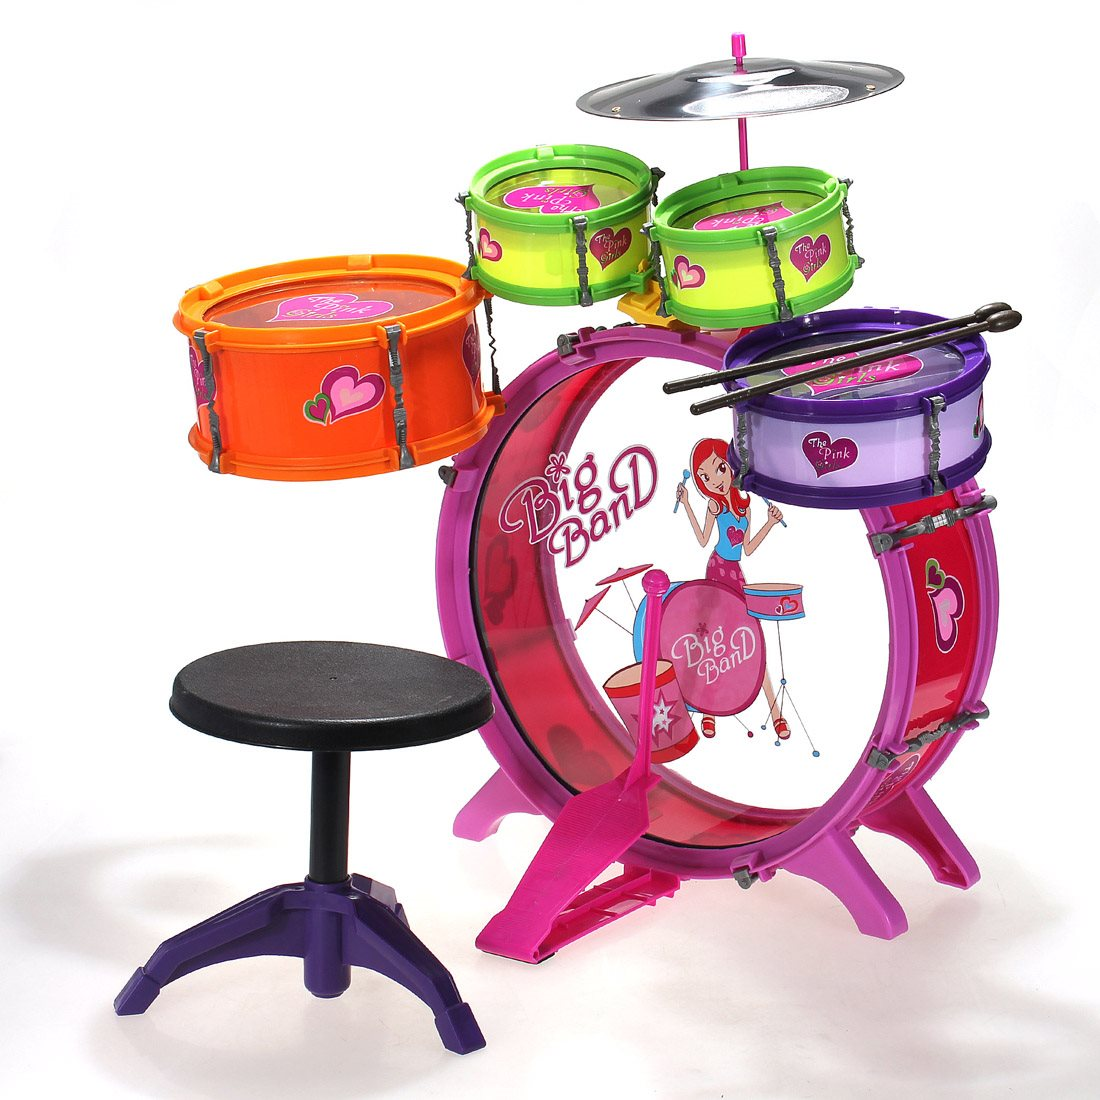 Small Crop Of Toddler Drum Set